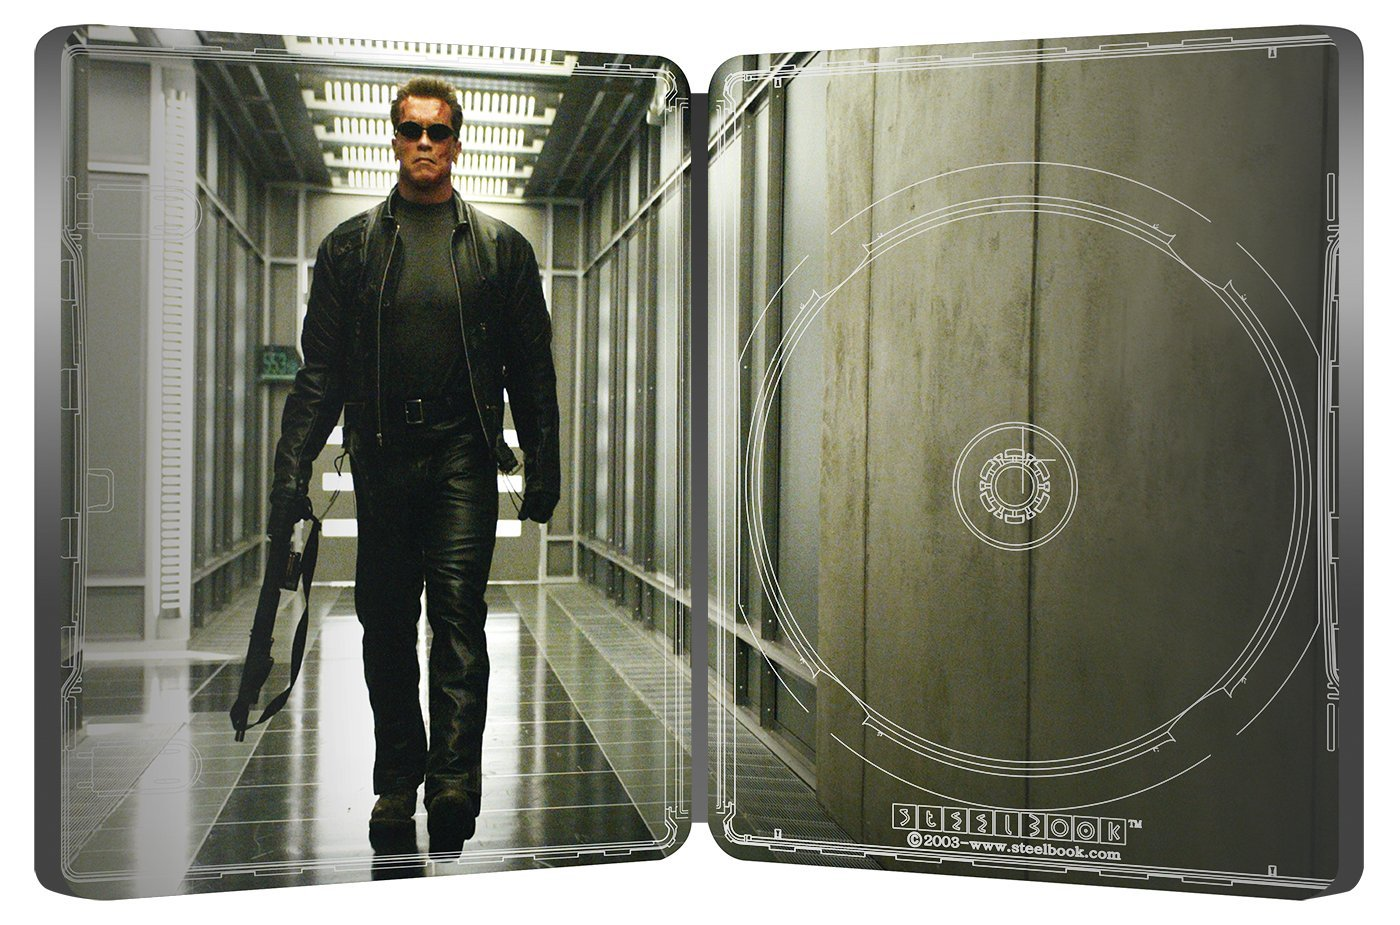 Terminator 3 steelbook it 2